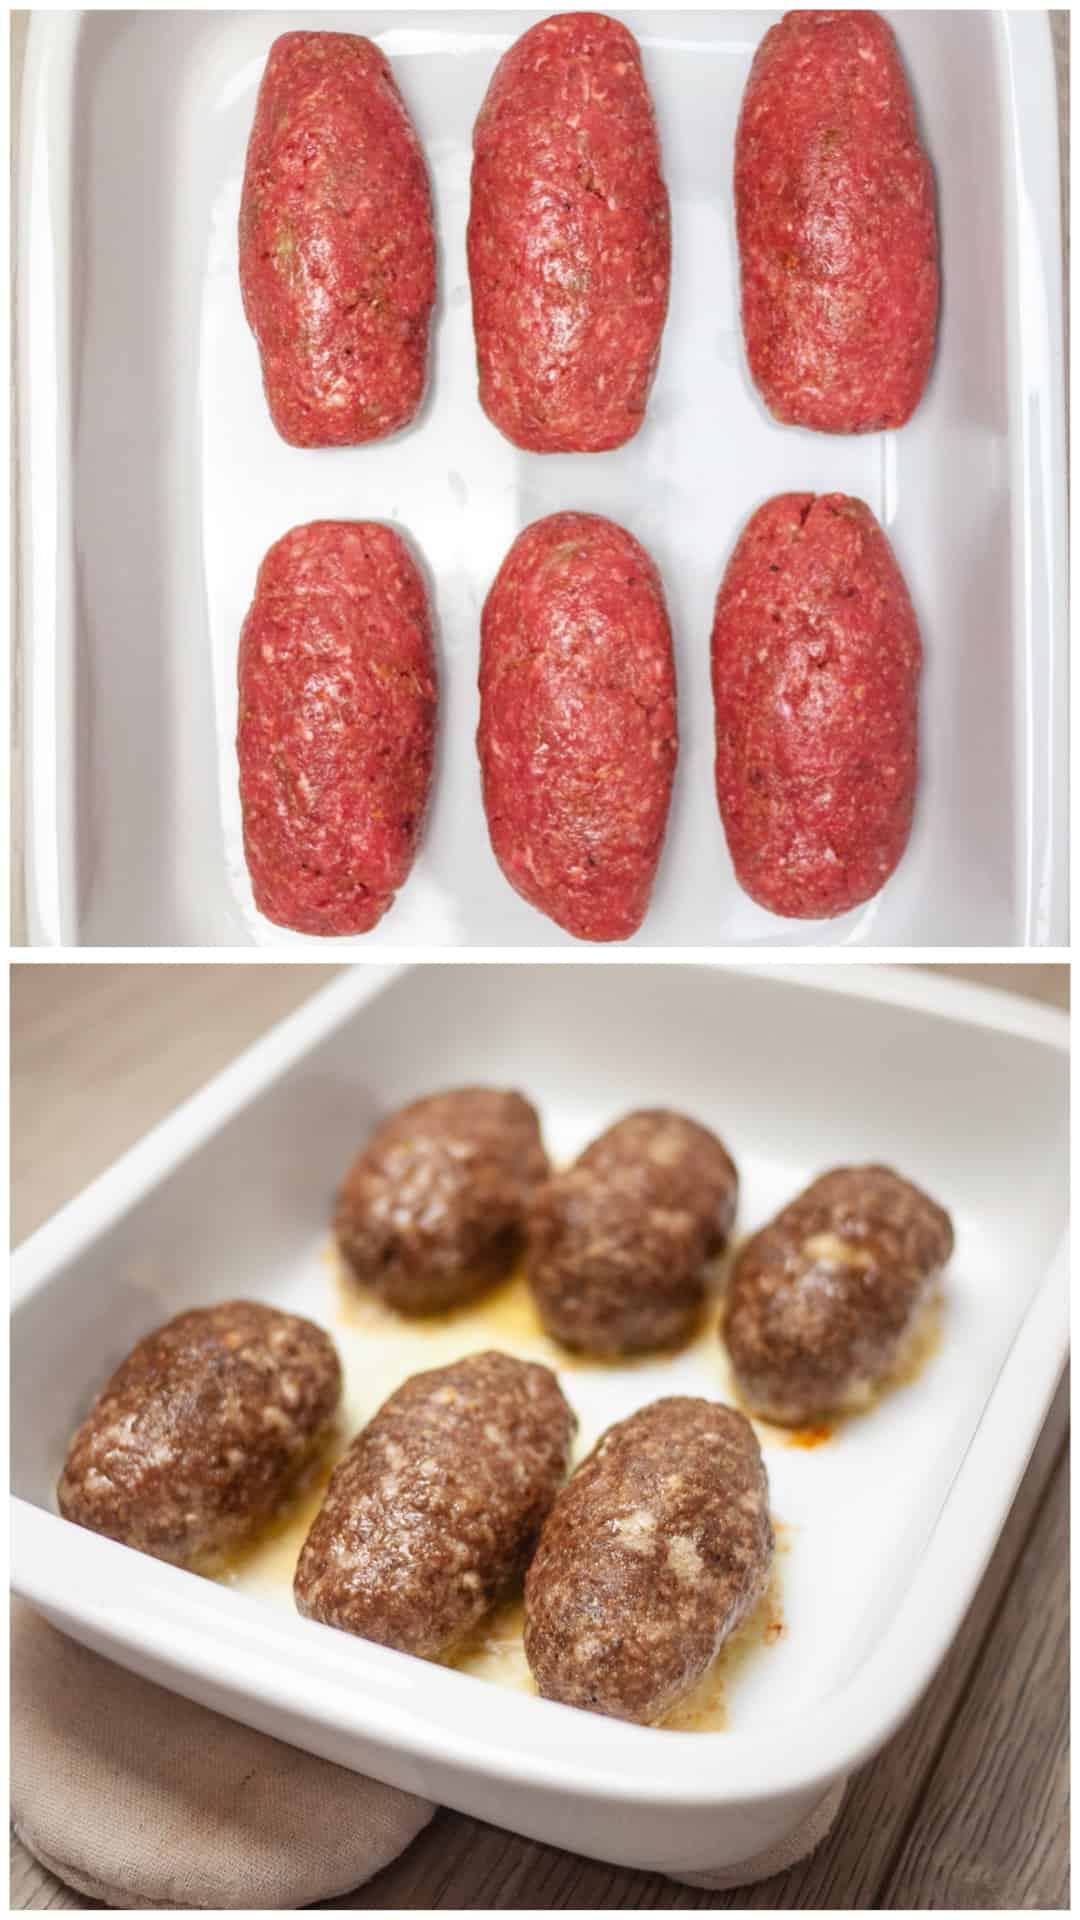 Traditional Soutzoukakia recipe (Greek baked Meatballs in tomato sauce) - preparing the meatballs